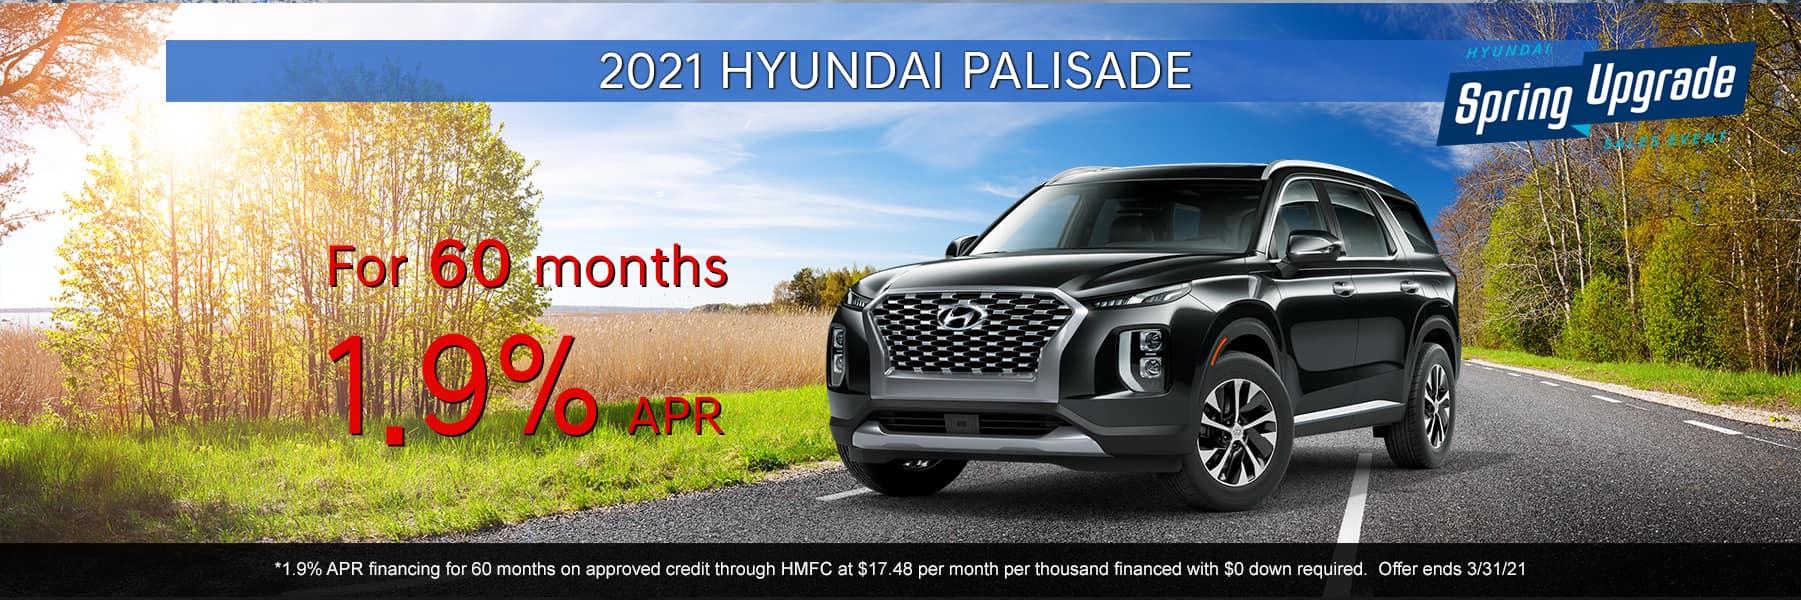 2021-Hyundai-Palisade-Mar2021